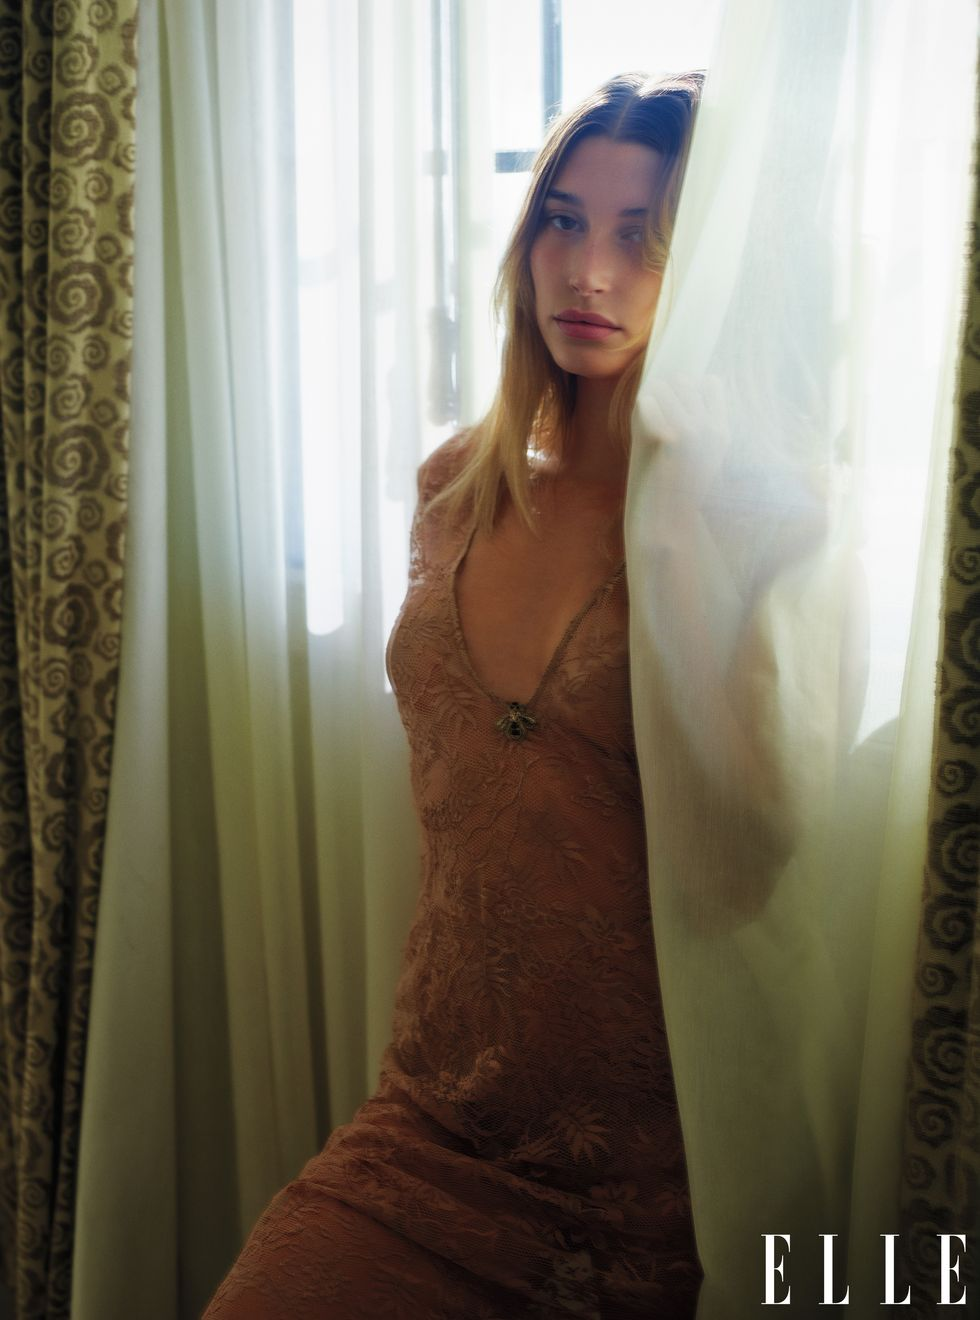 Versace, Saint Laurent и Gucci: Хейли Бибер в объективе Марио Сорренти